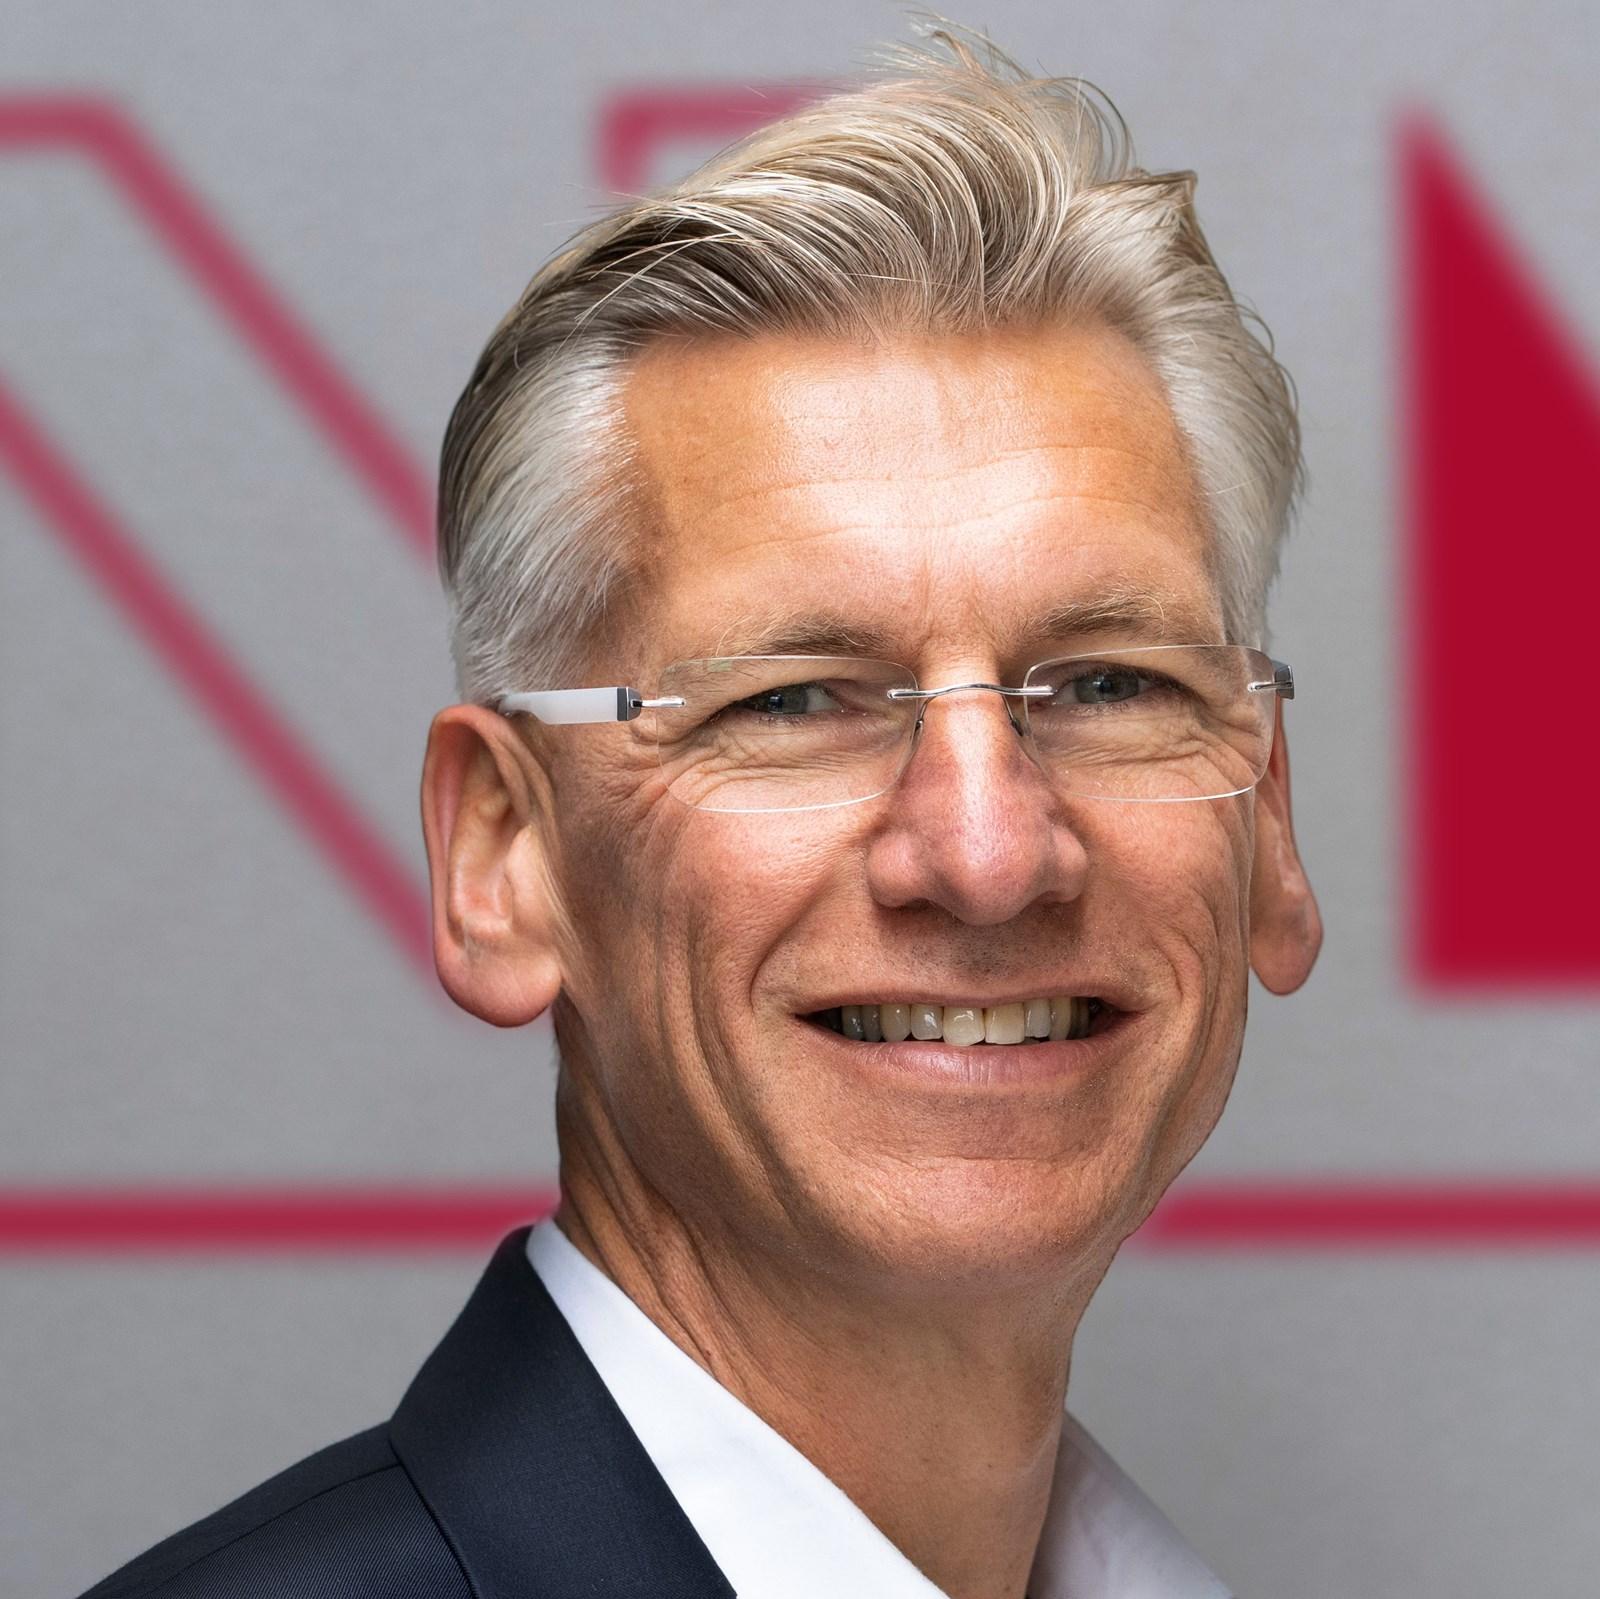 Niels Jimmink